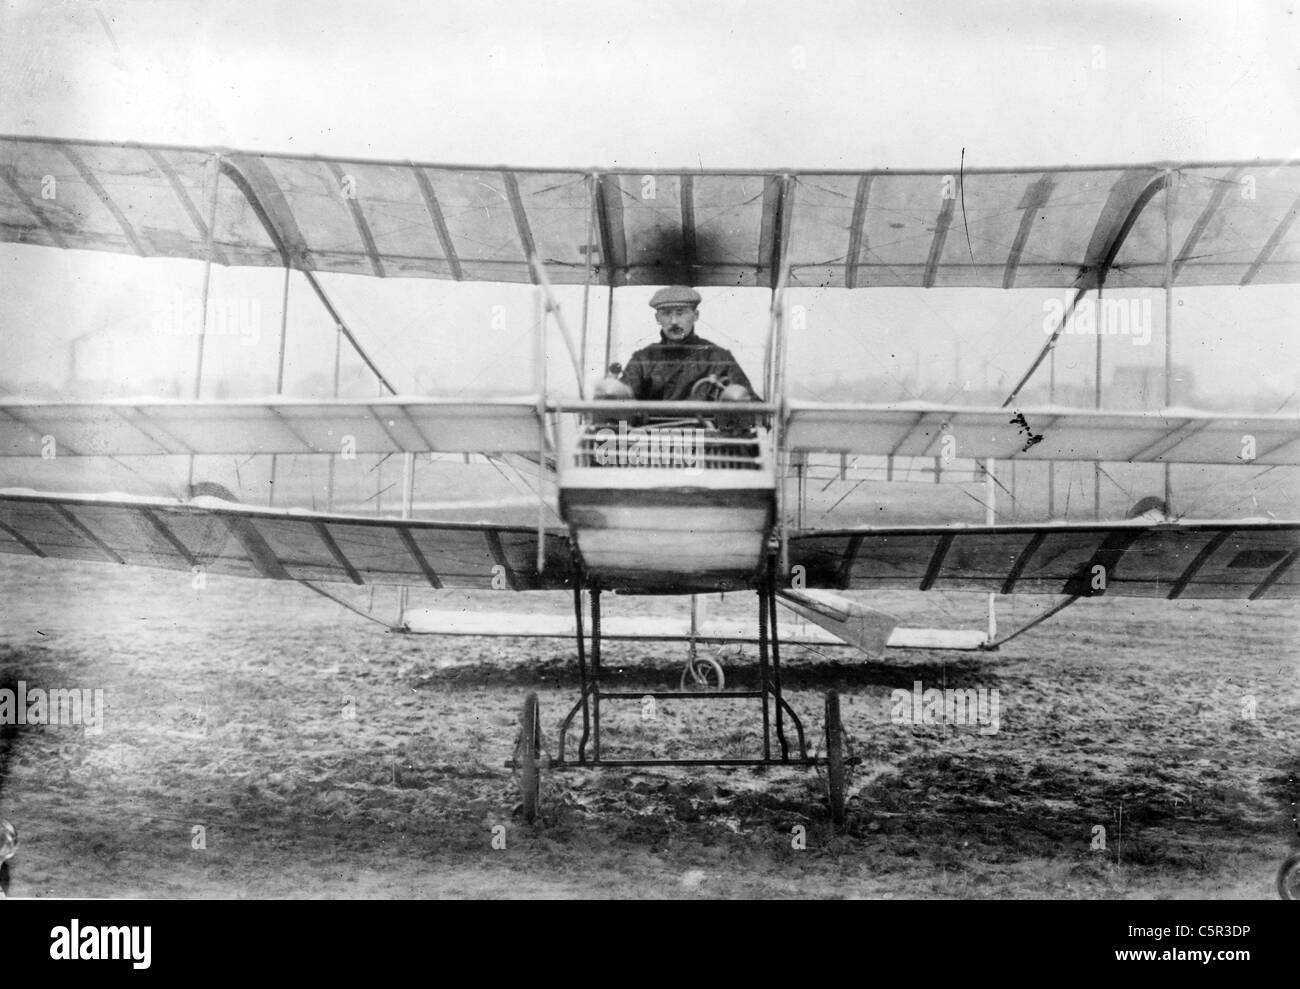 Delagrange in his aeroplane, Leon Delagrange Stock Photo